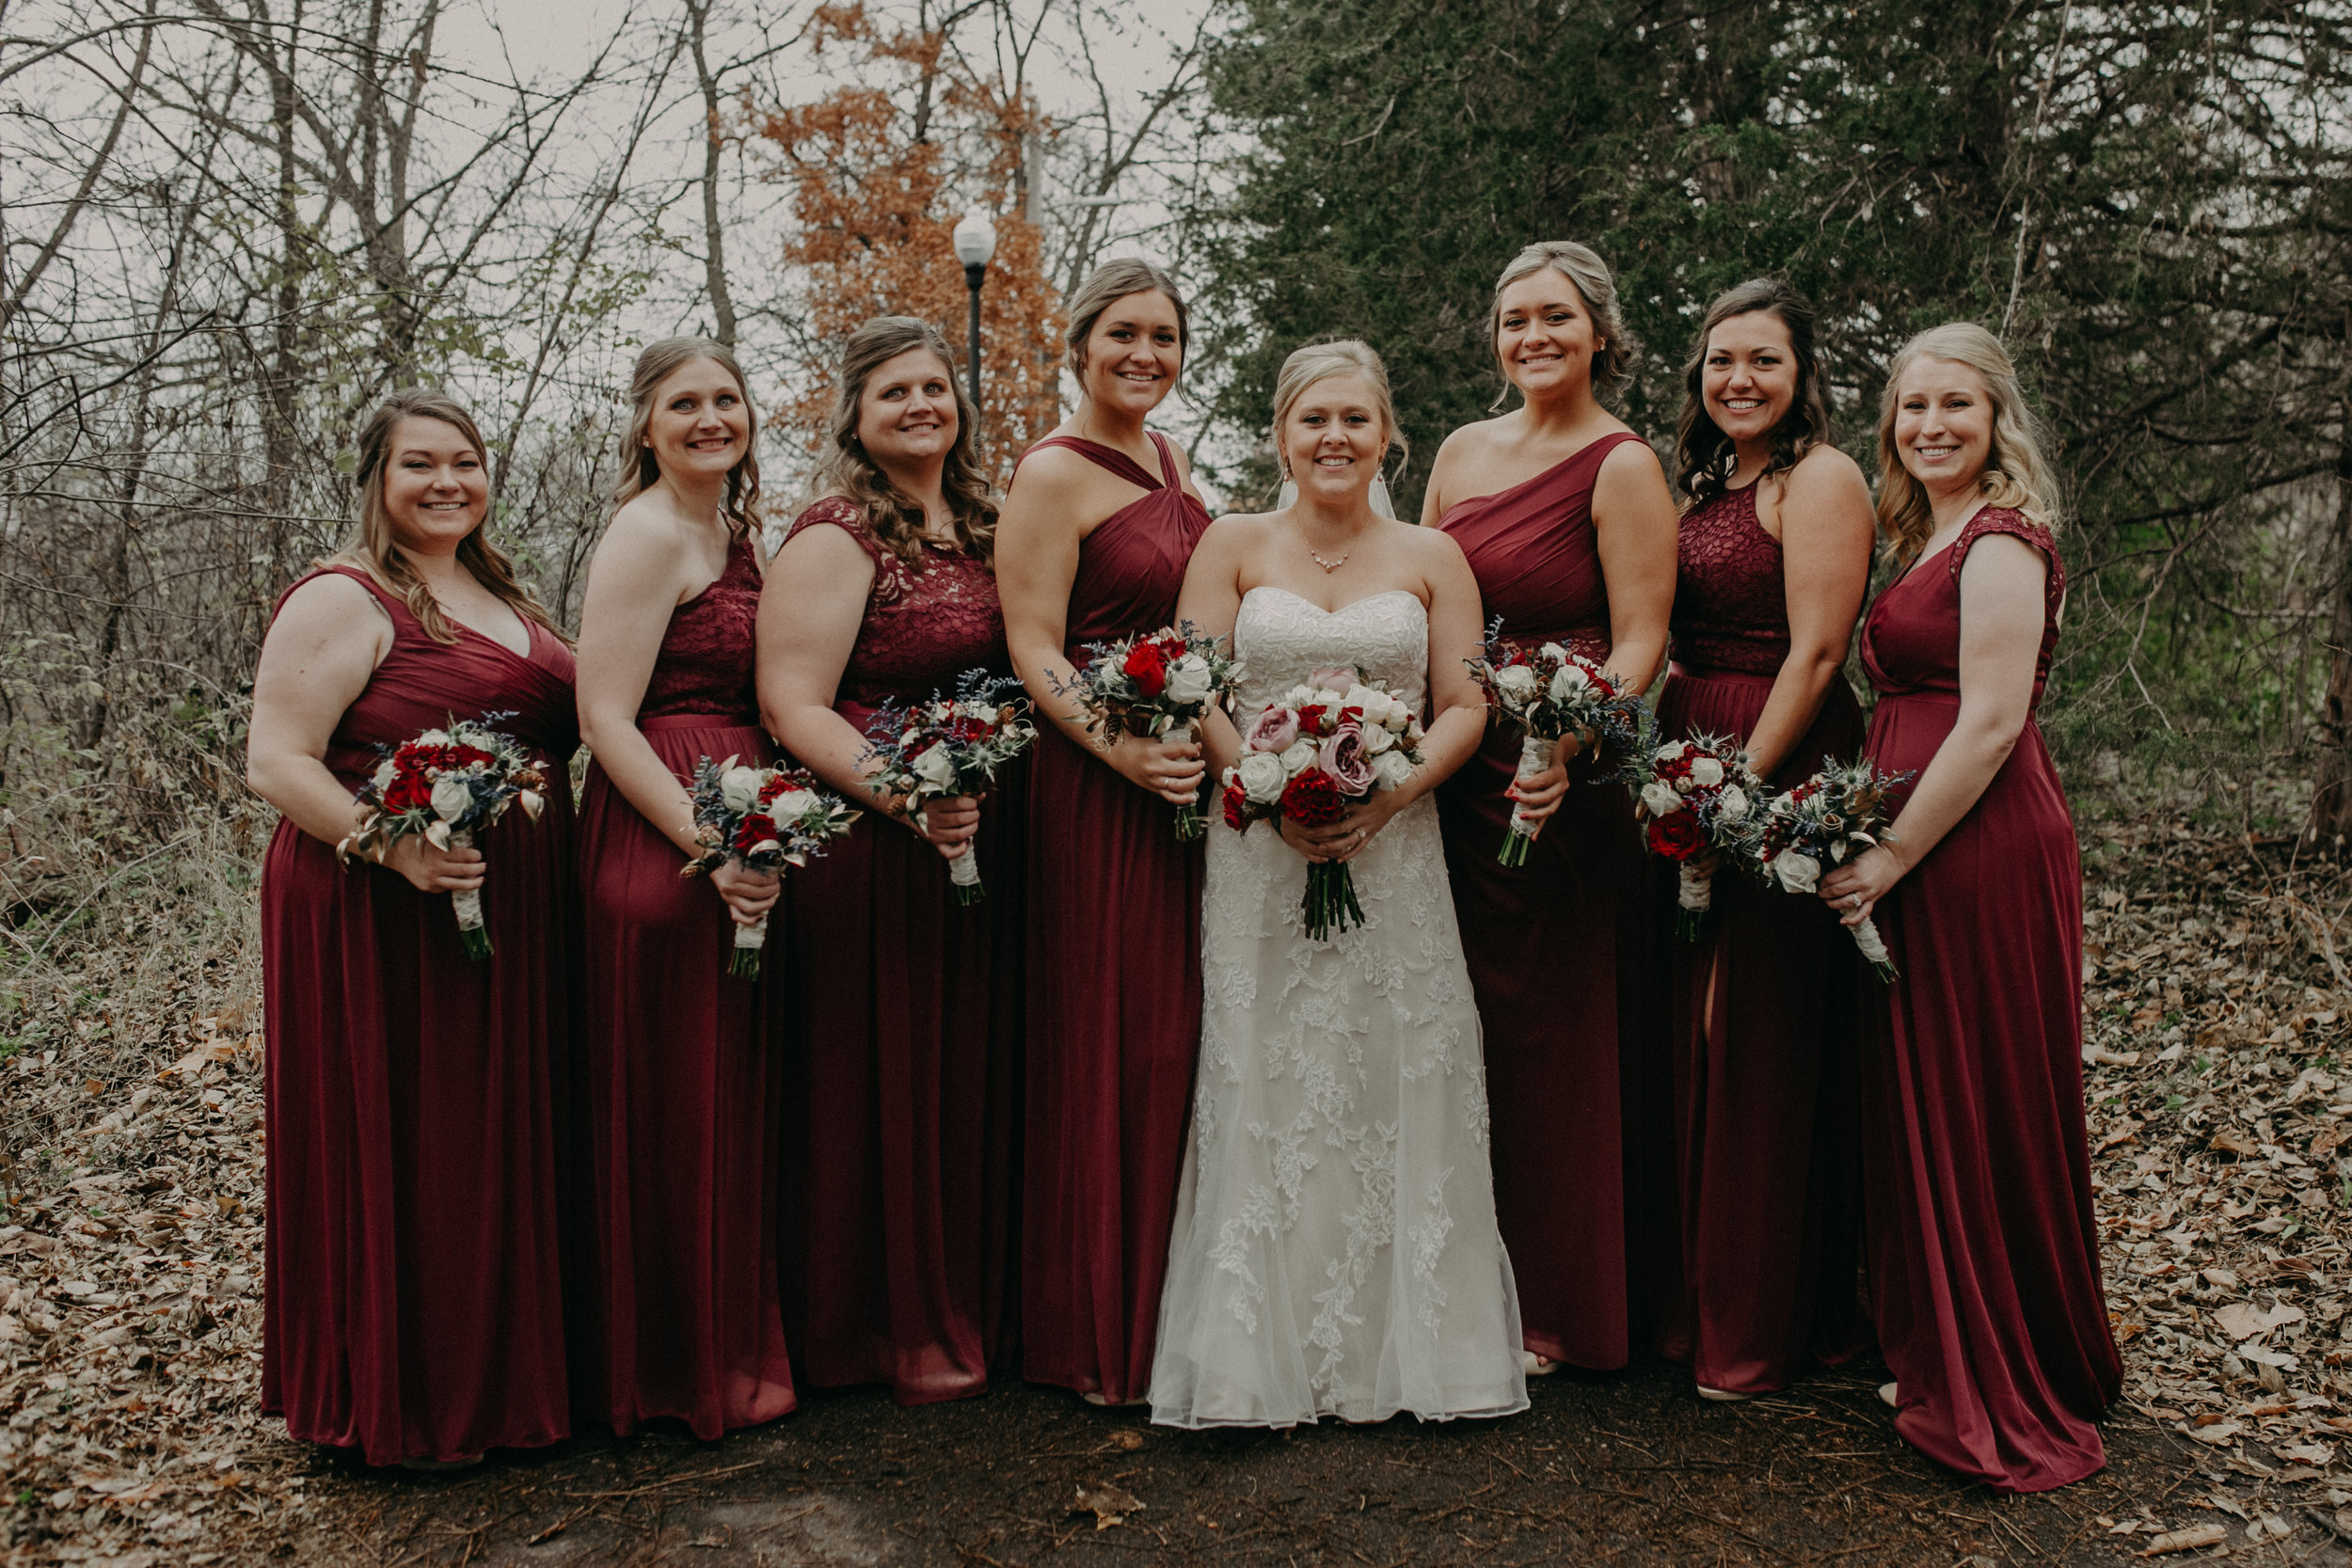 Weisenbeck_Wedding_Oct2018-469.jpg